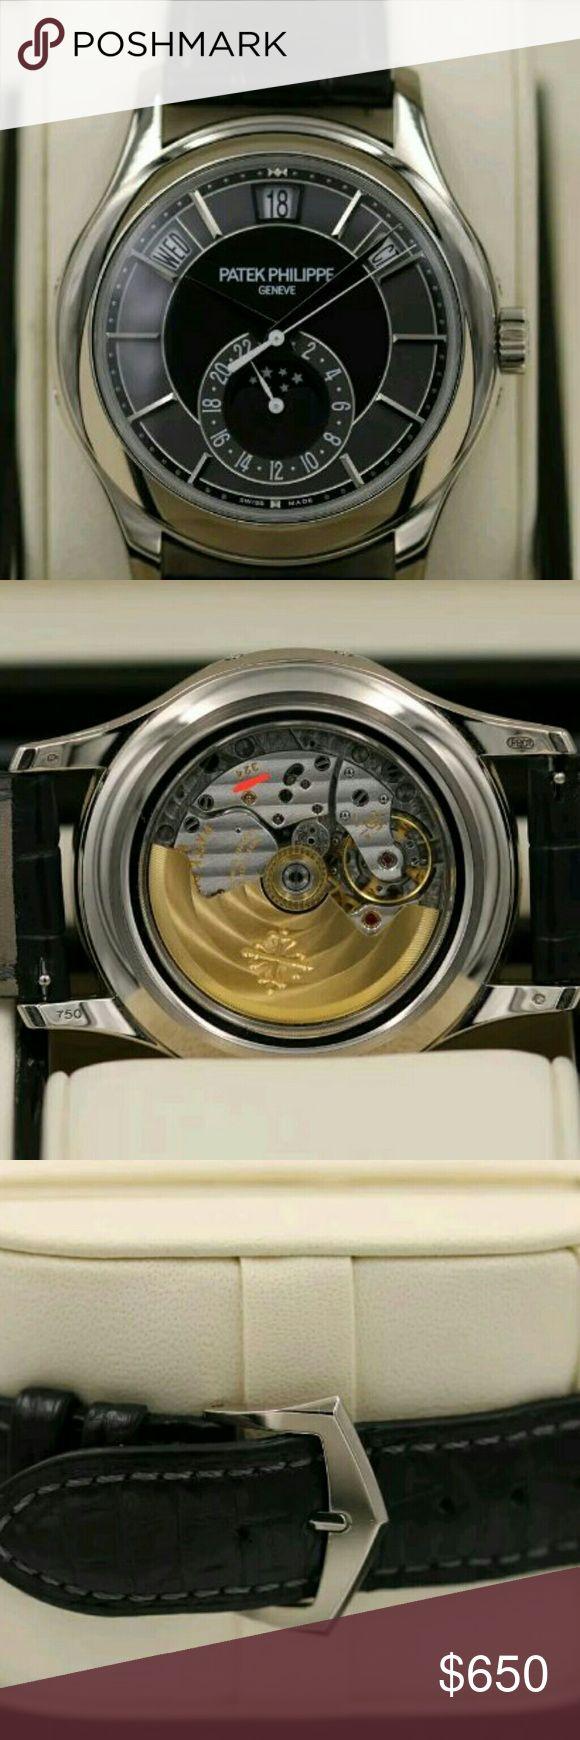 Patek phillippe very good watch. In very good condition. Patek Philippe Jewelry Bracelets